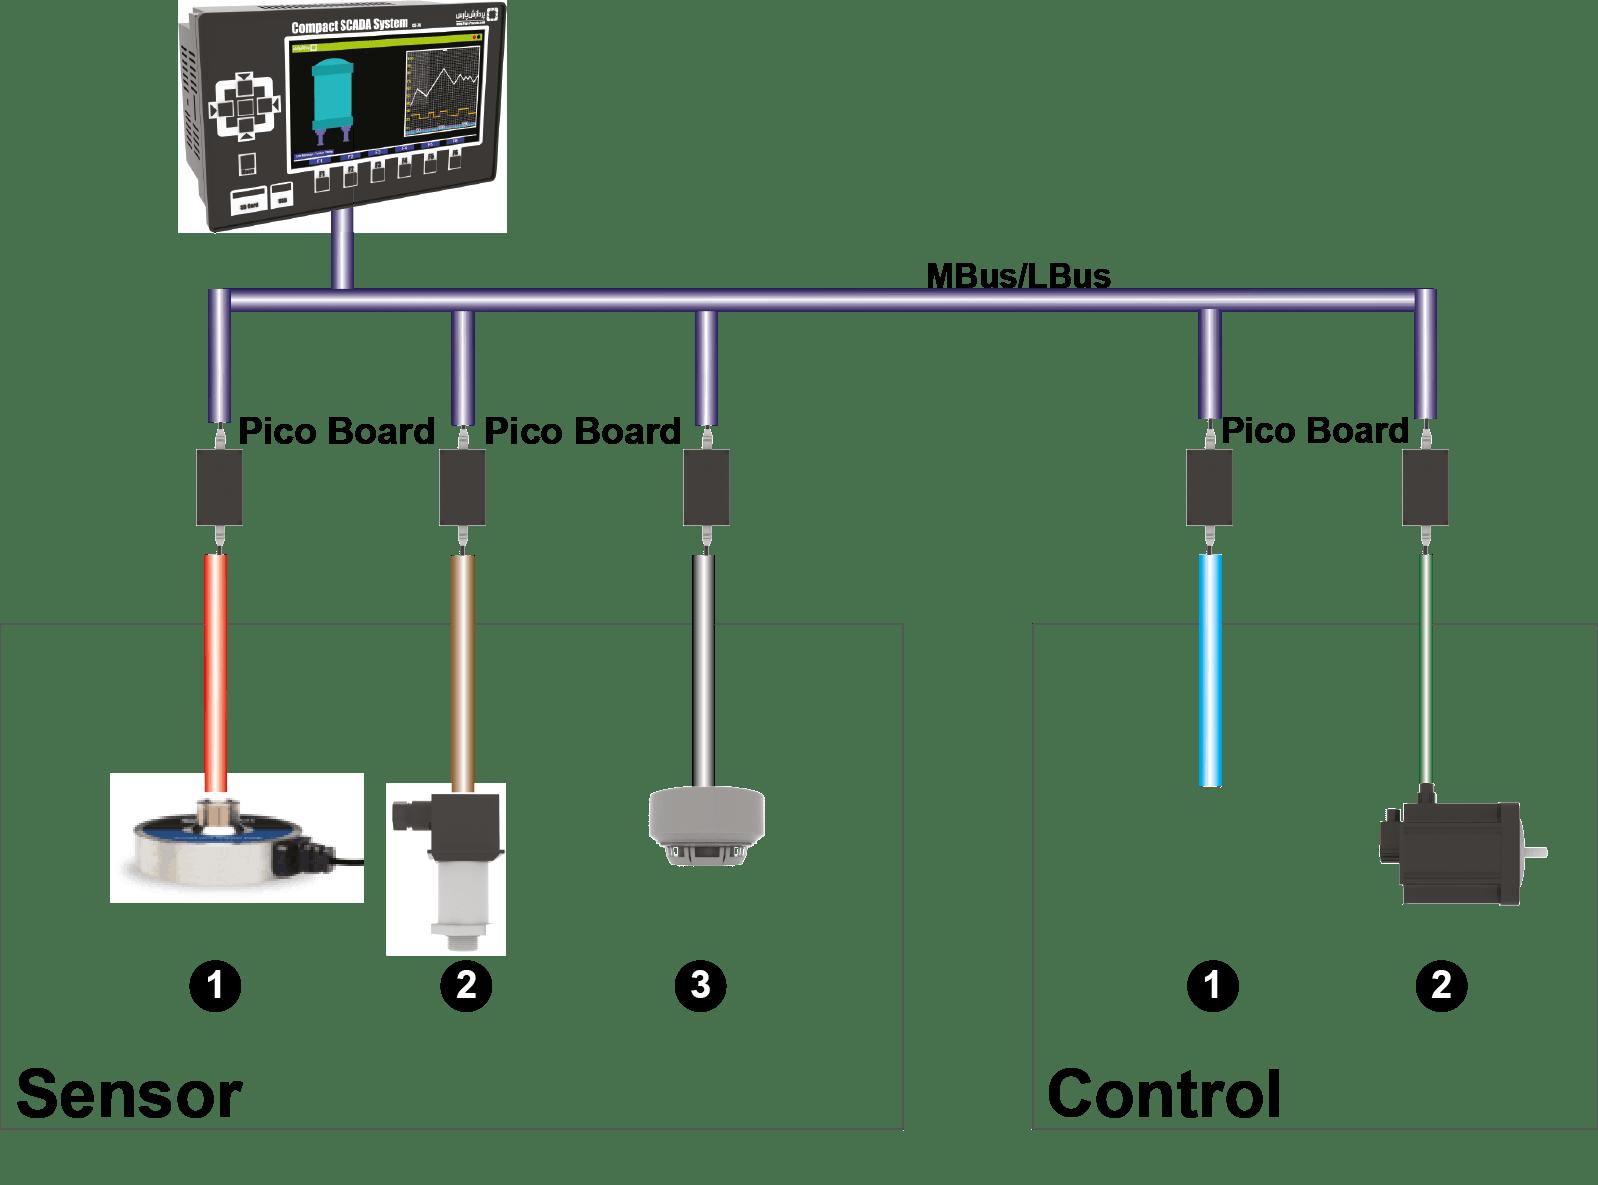 citroen c4 wiring diagram vw passat engine light torzone org auto